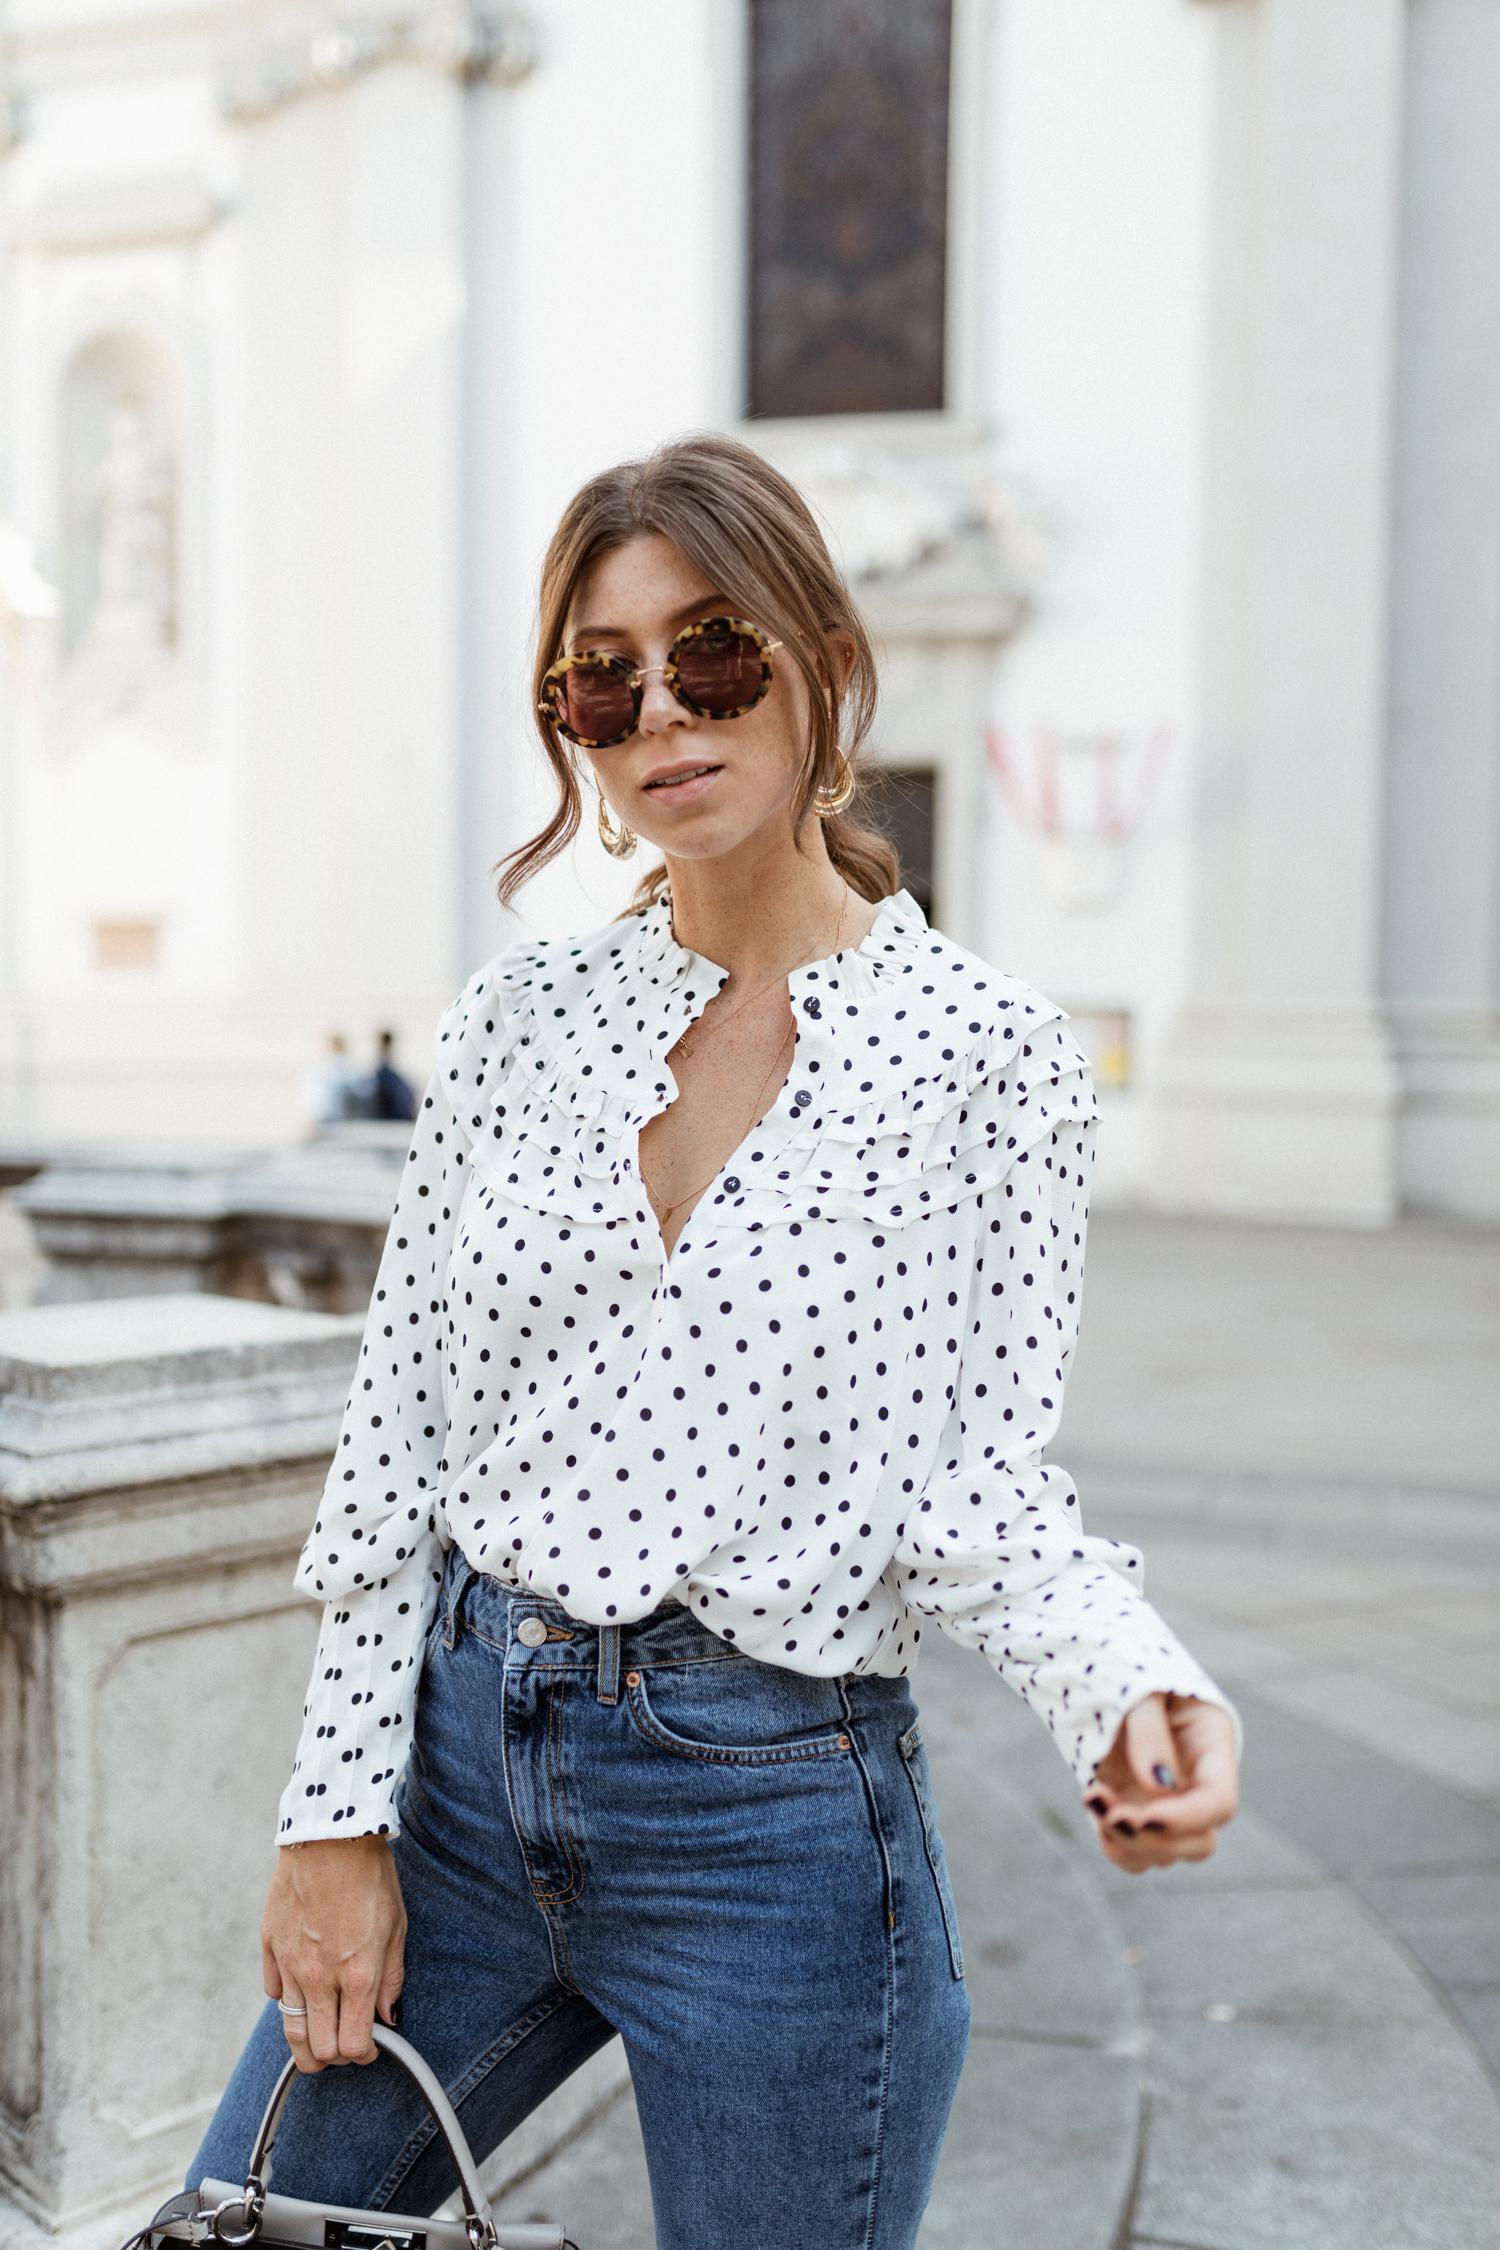 Topshop spot Frill neck blouse & jeans, Fendi bag, Miu Miu sunglasses, Public Desire heels - Bikinis & Passports